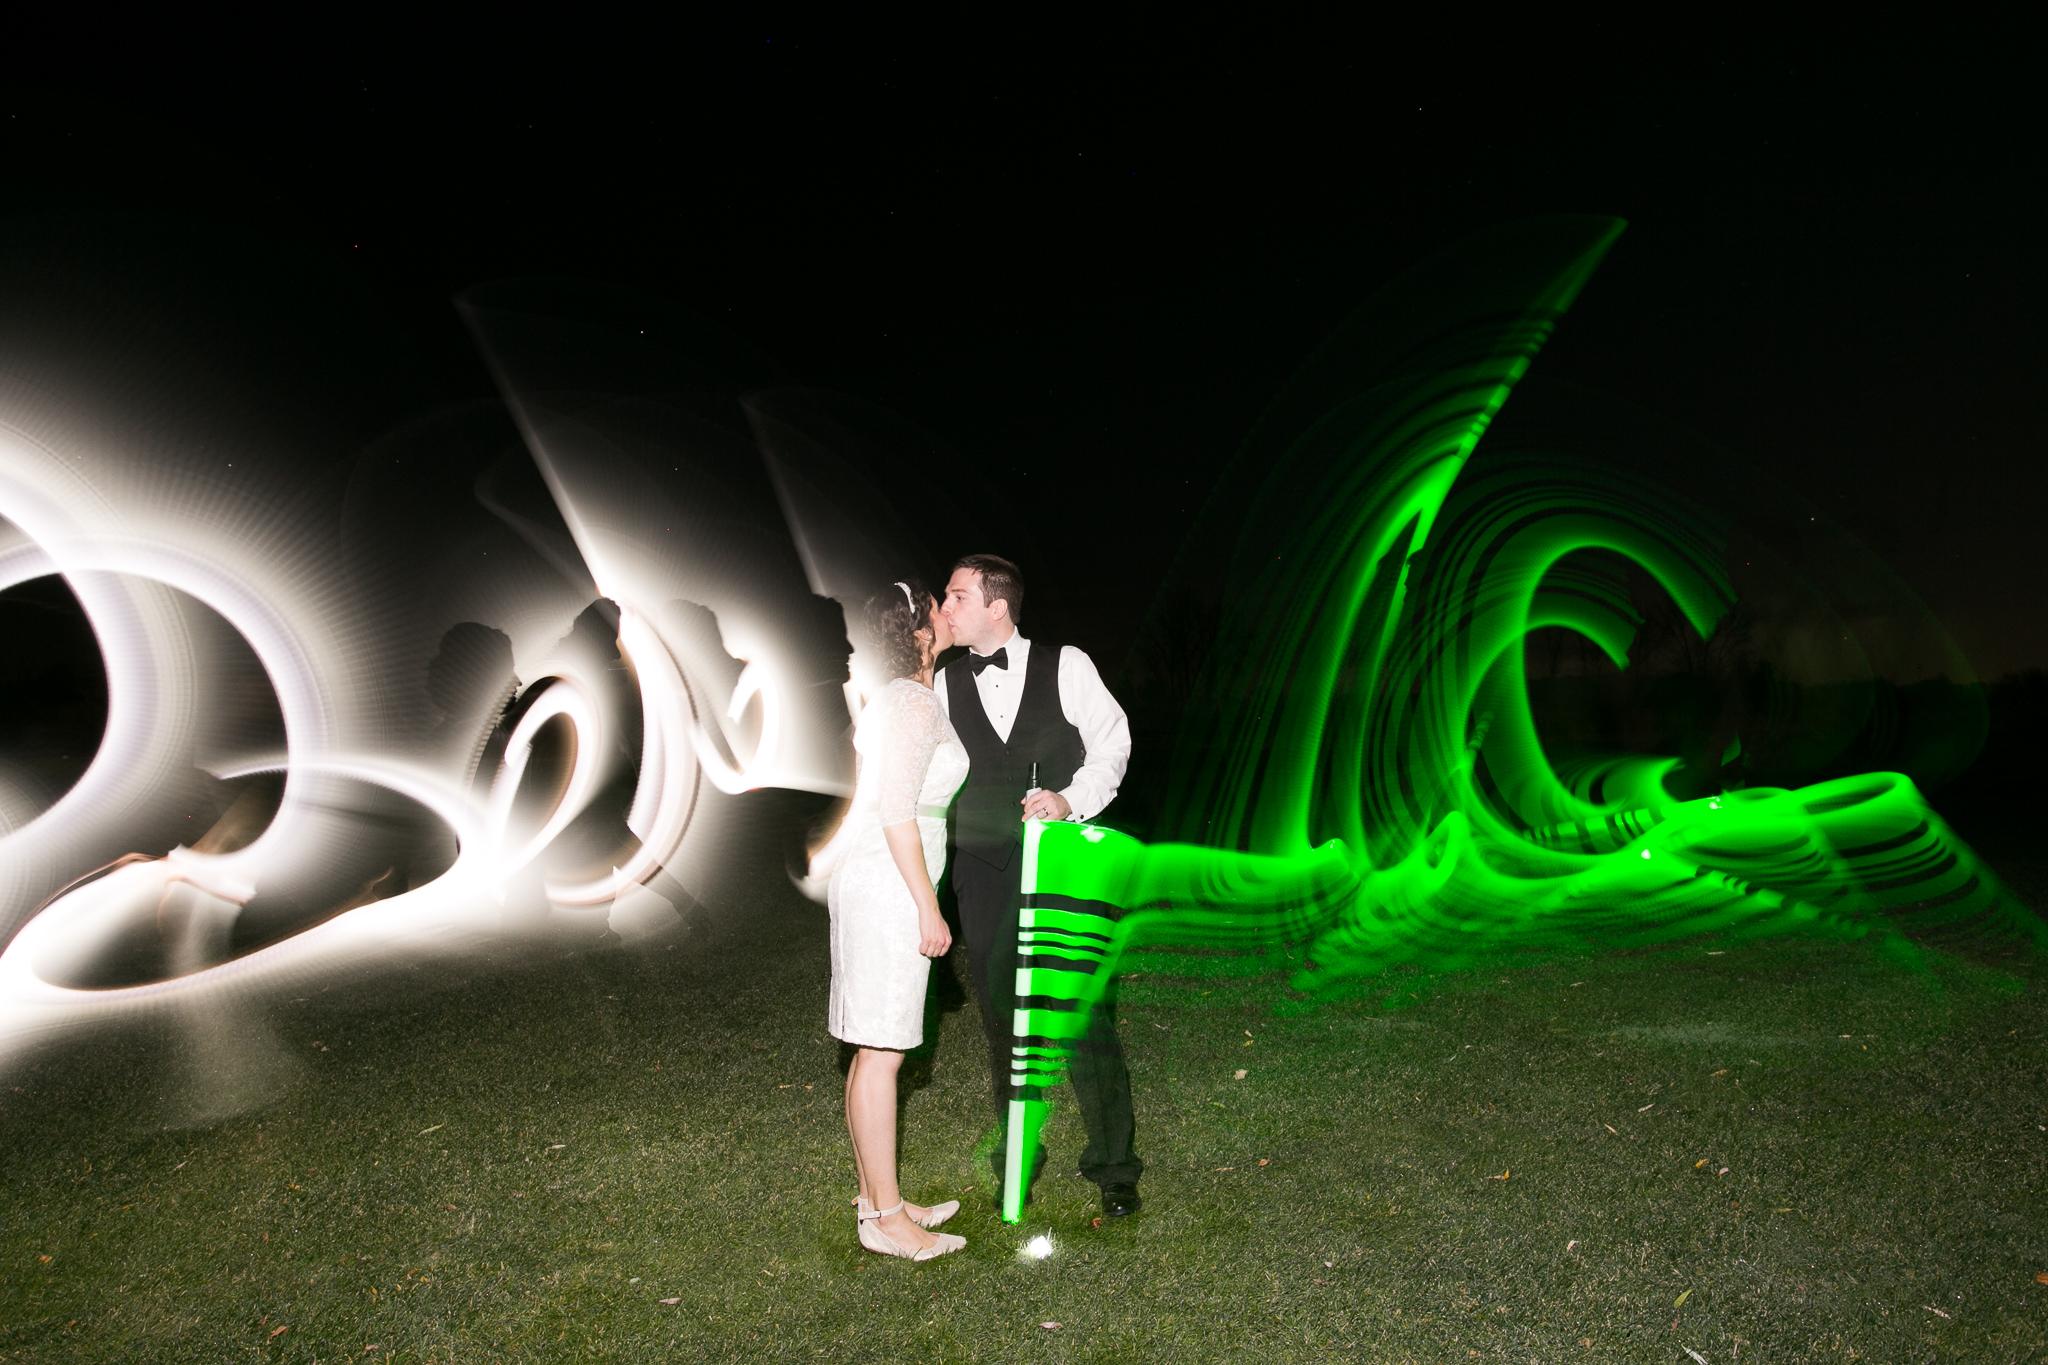 camuglia-whomstudio-chelsea_and_andy-nycphotographer-wedding-brooklyn-buffalo-timberlodge-186-5771.jpg